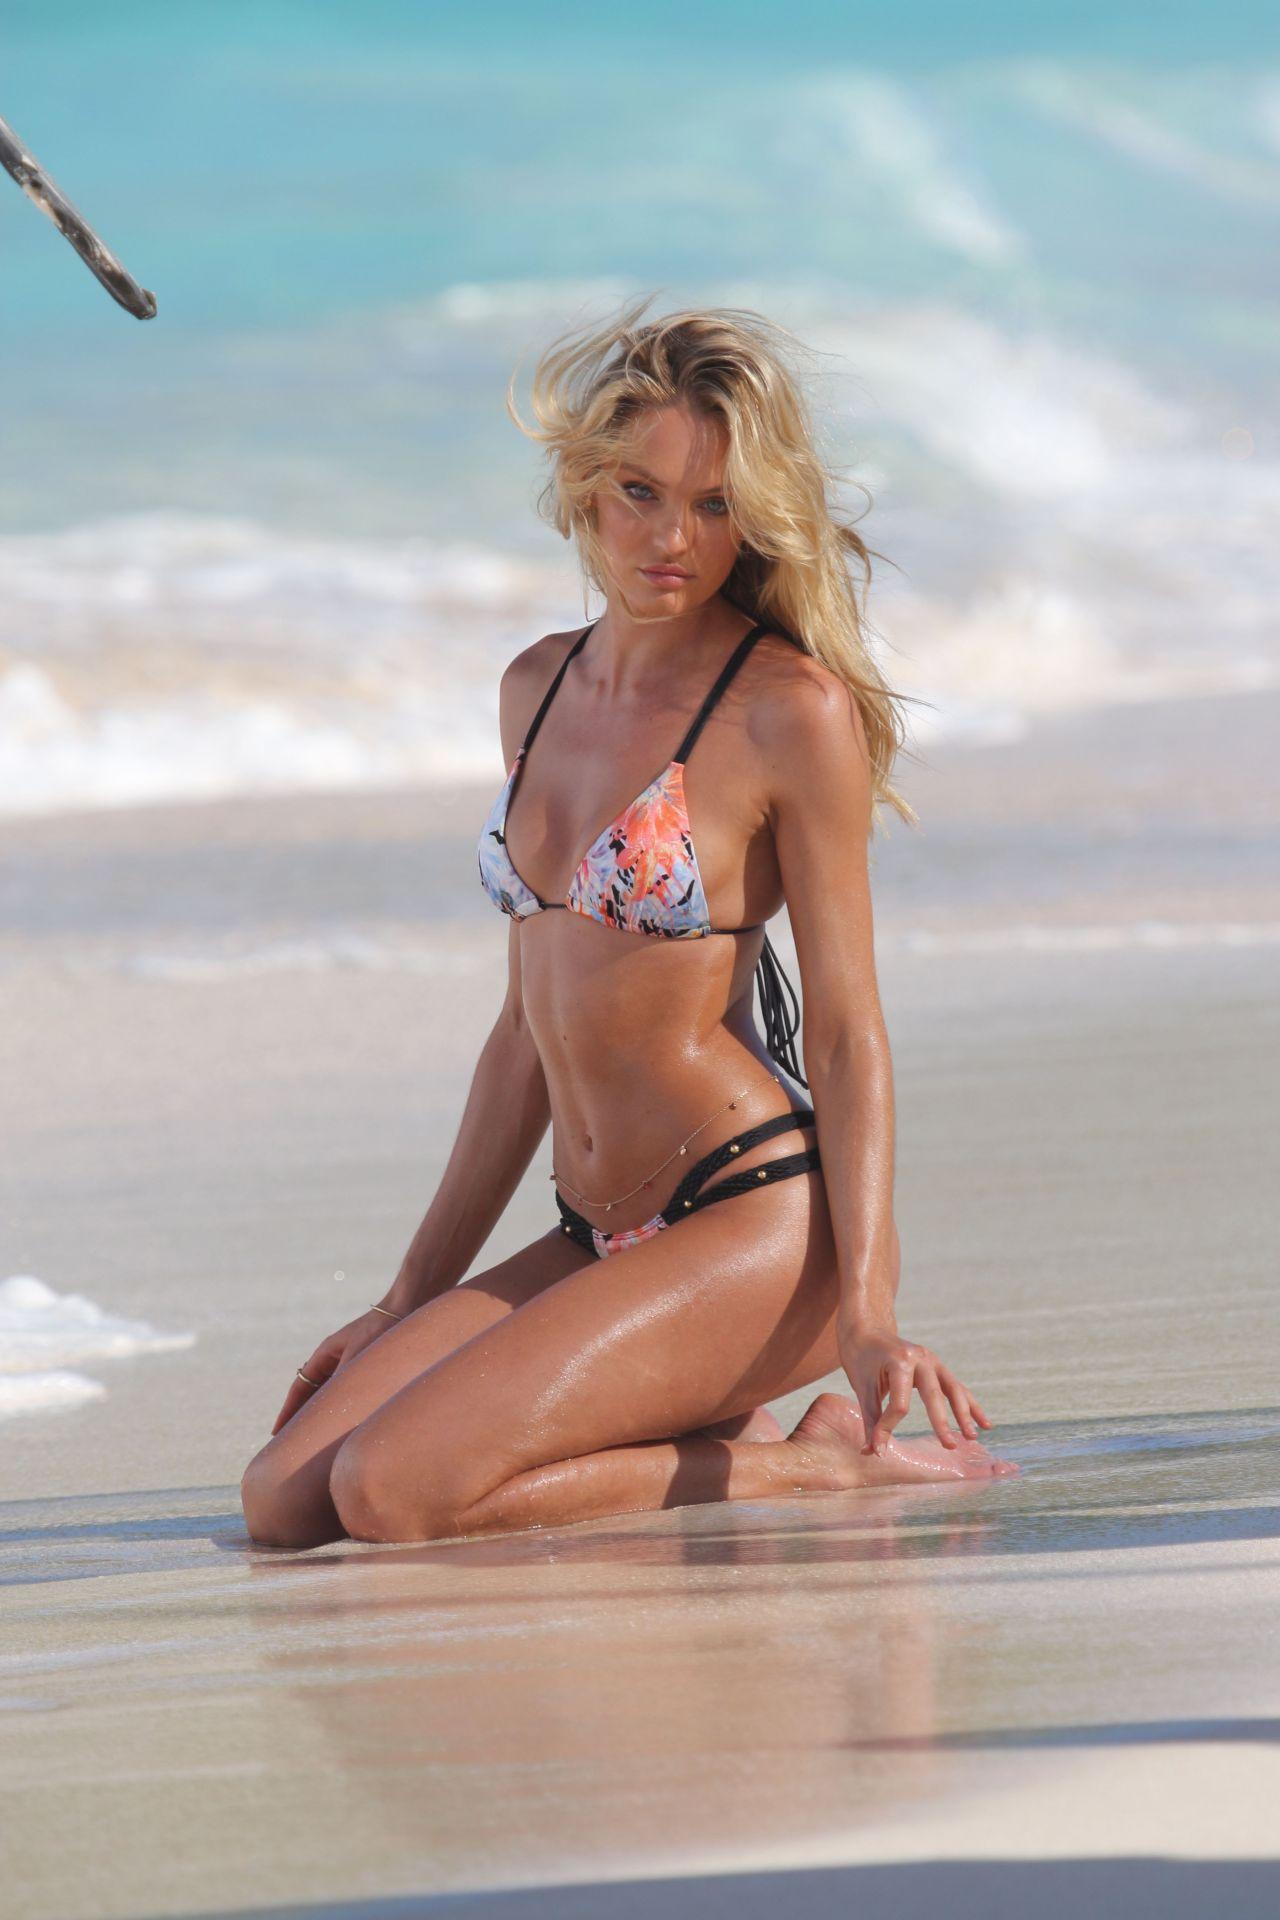 shoot Candice swanepoel bikini